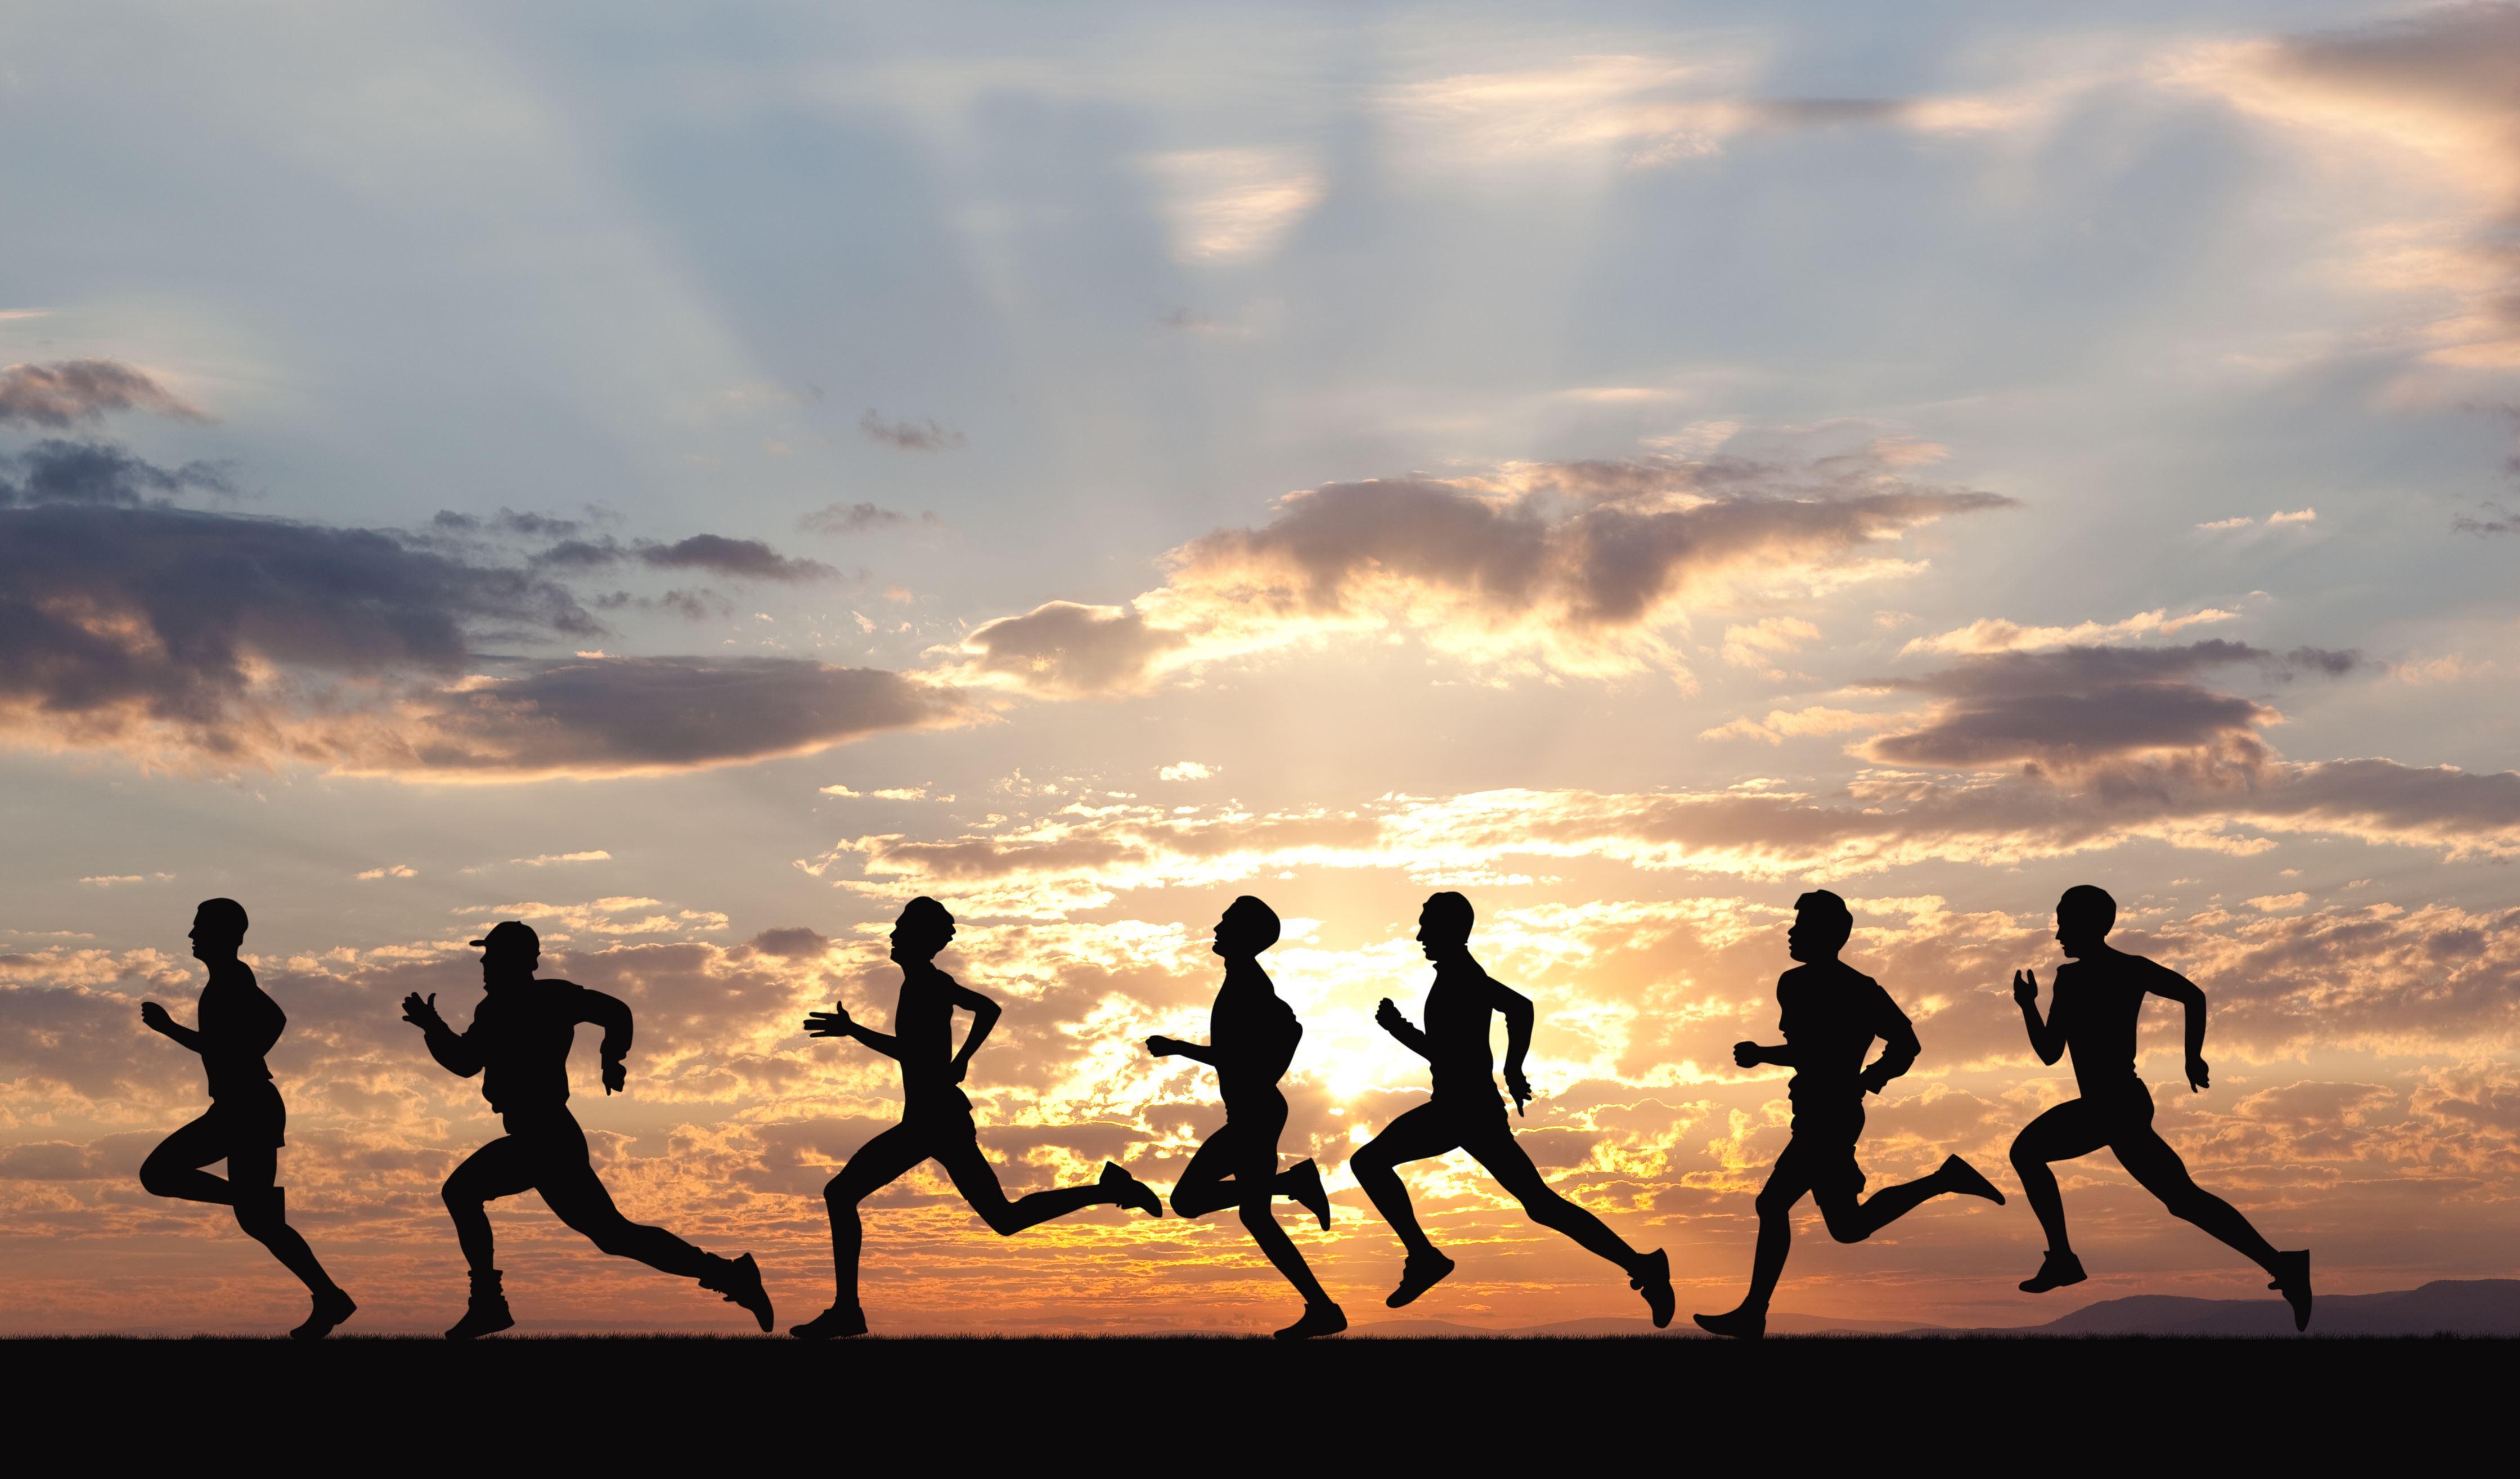 Marathon, black silhouettes of runners on the sunset